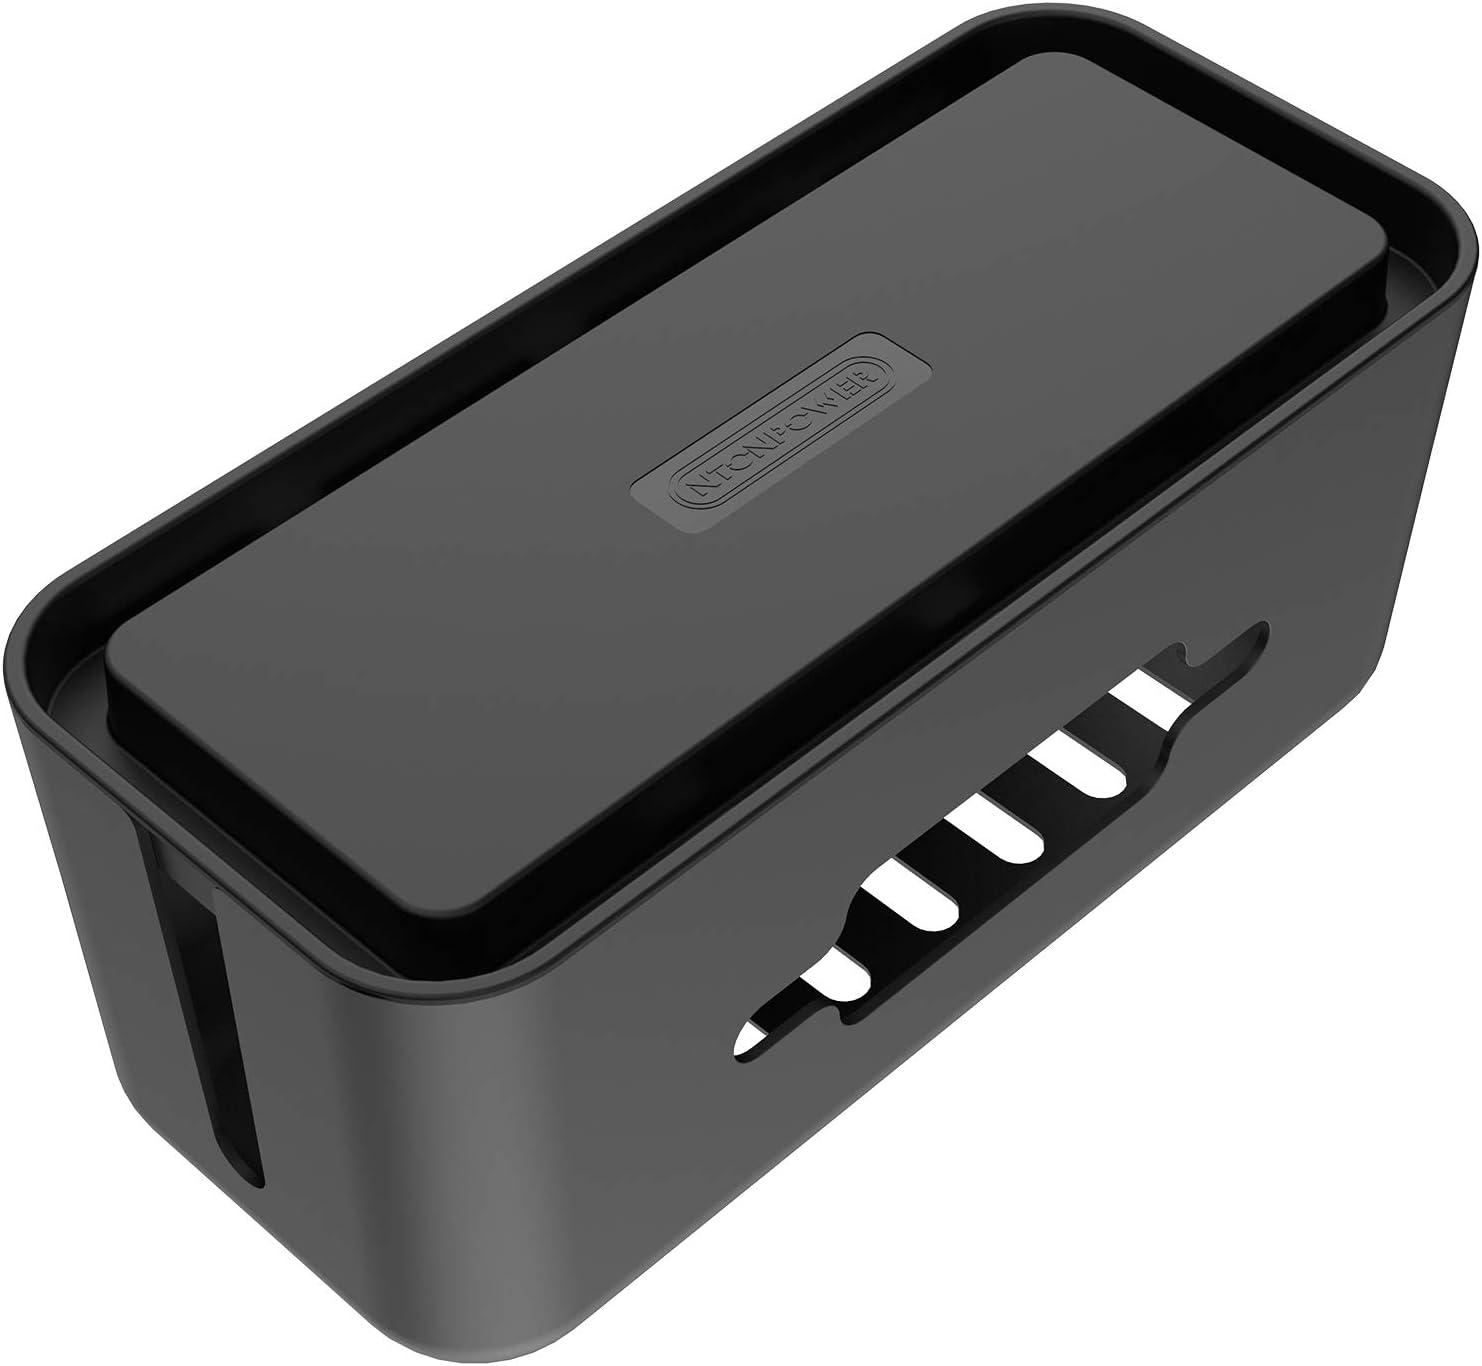 Ntonpower Kabelbox Groß Xxl Steckdosenbox Kabelsammler Elektronik